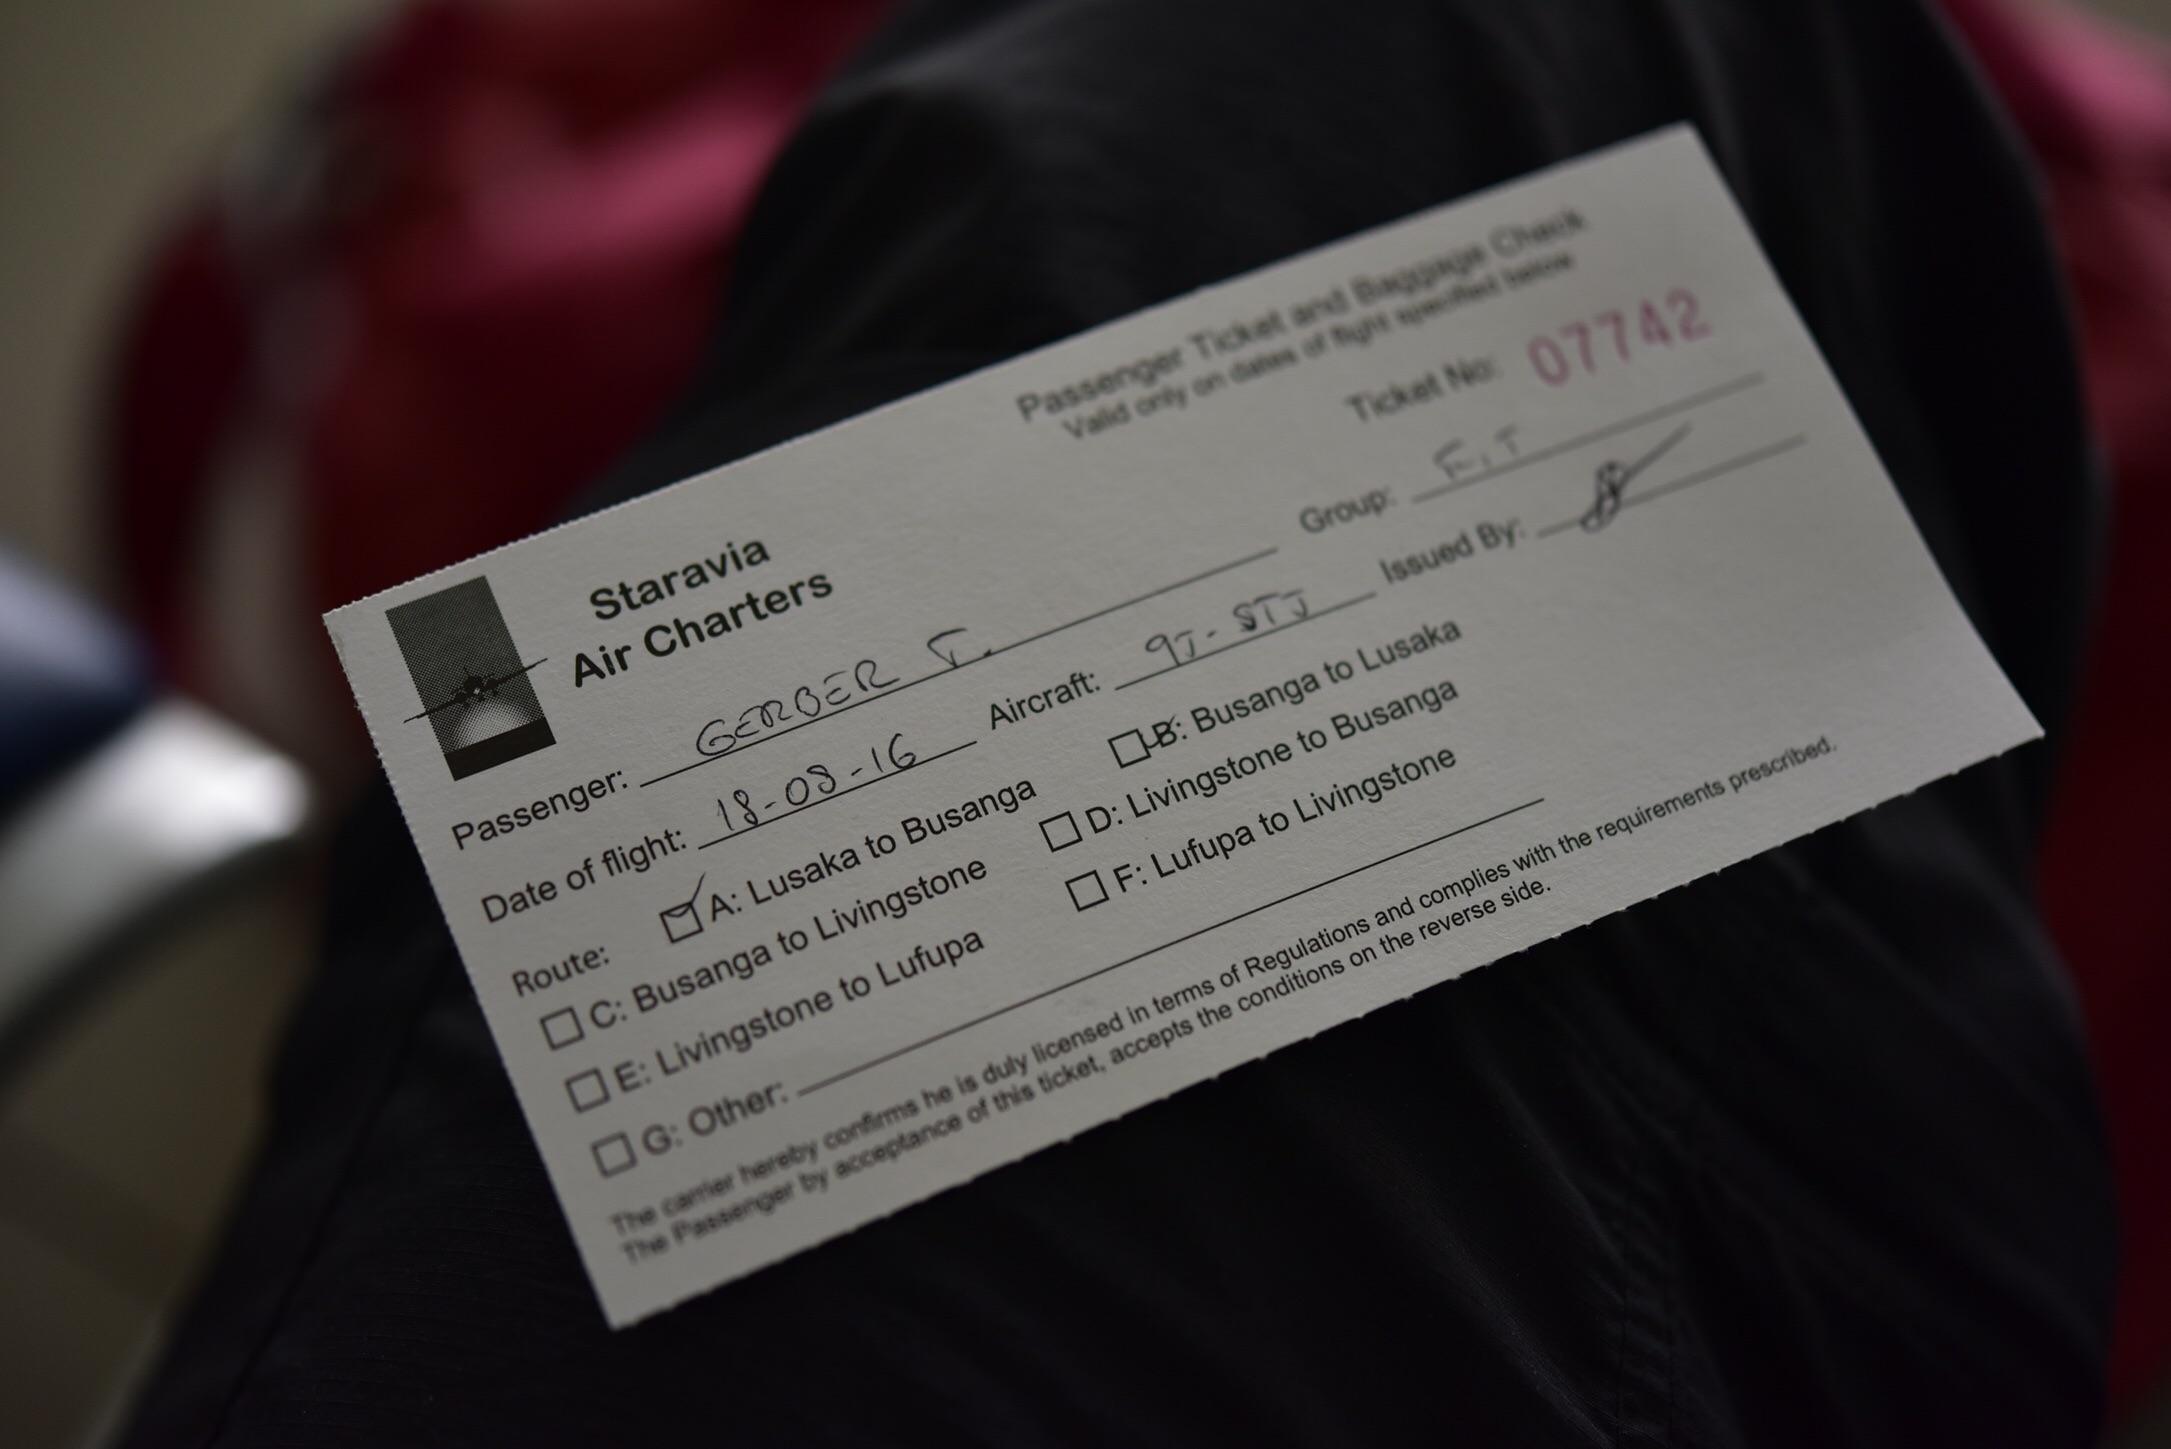 You gotta love the handwritten boarding passes.